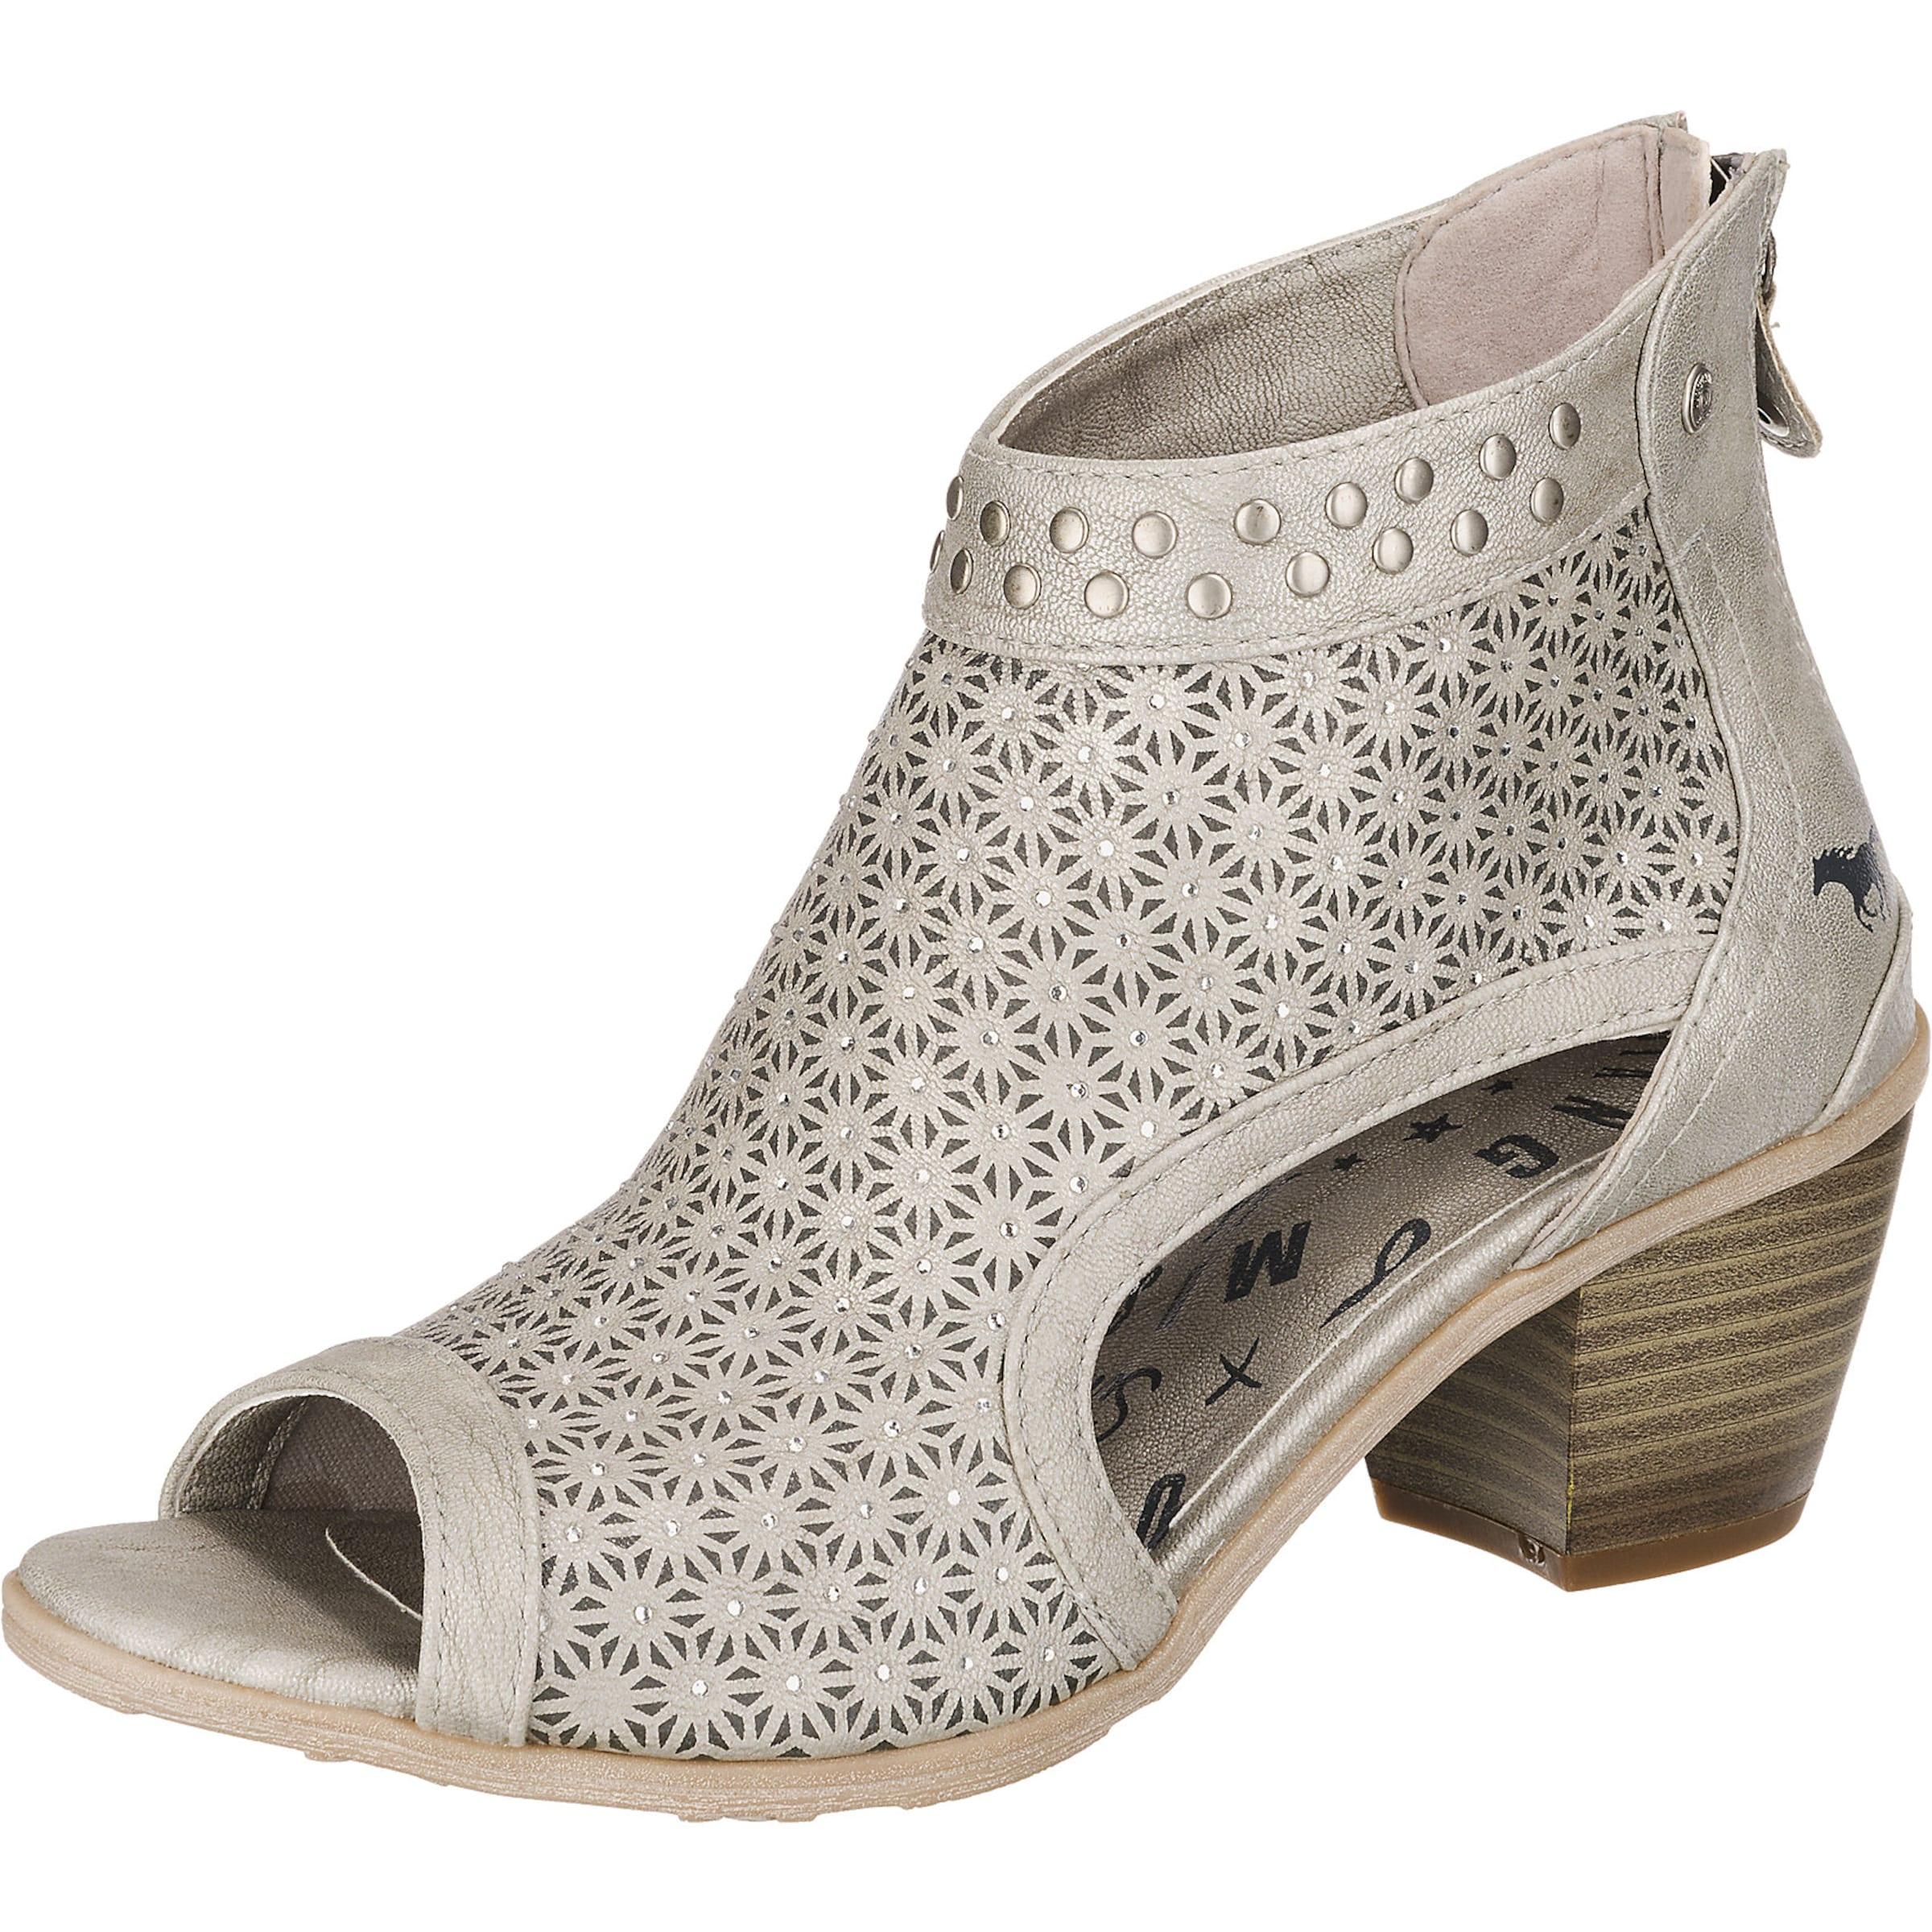 MUSTANG Sandalette Günstige und langlebige Schuhe